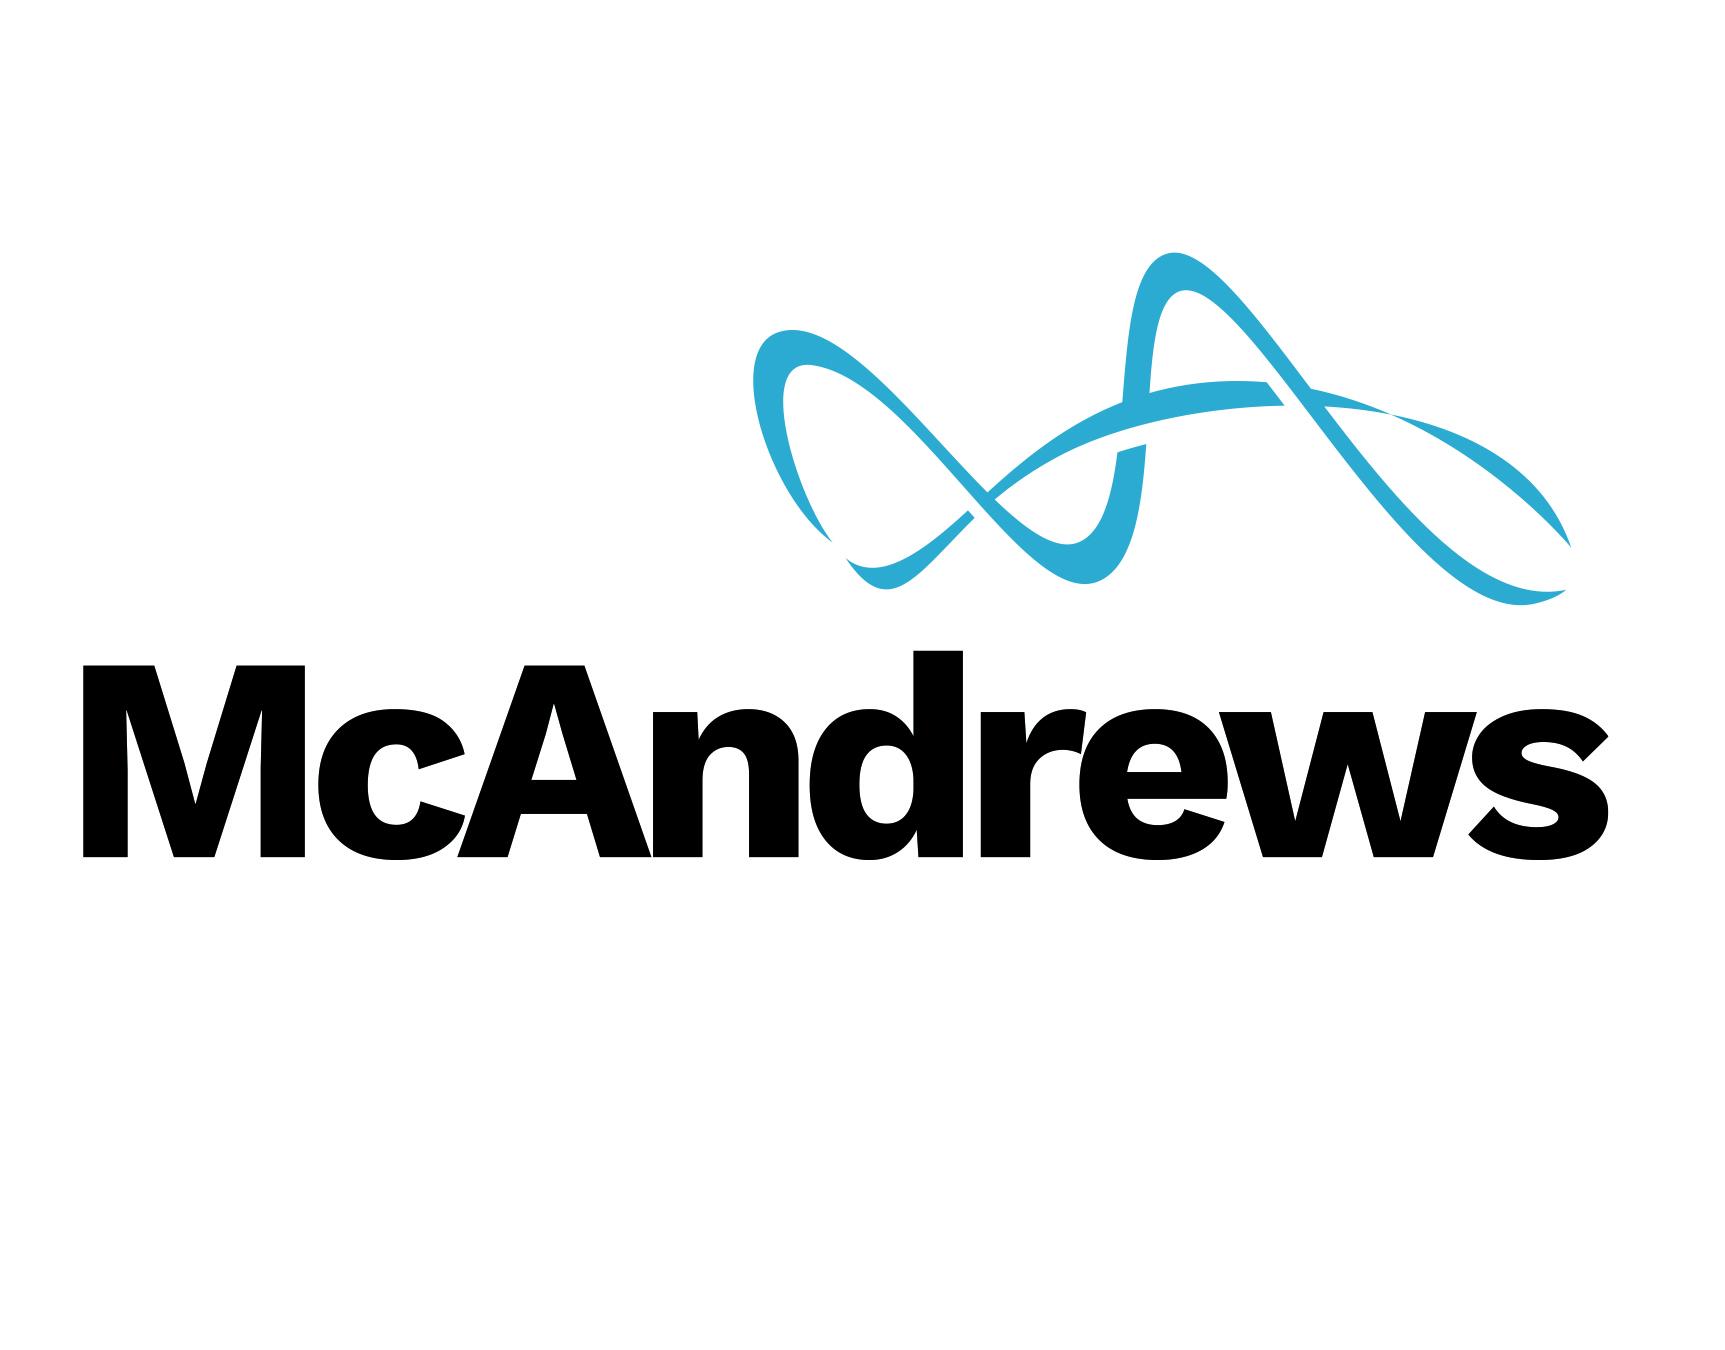 McAndrews Held & Malloy